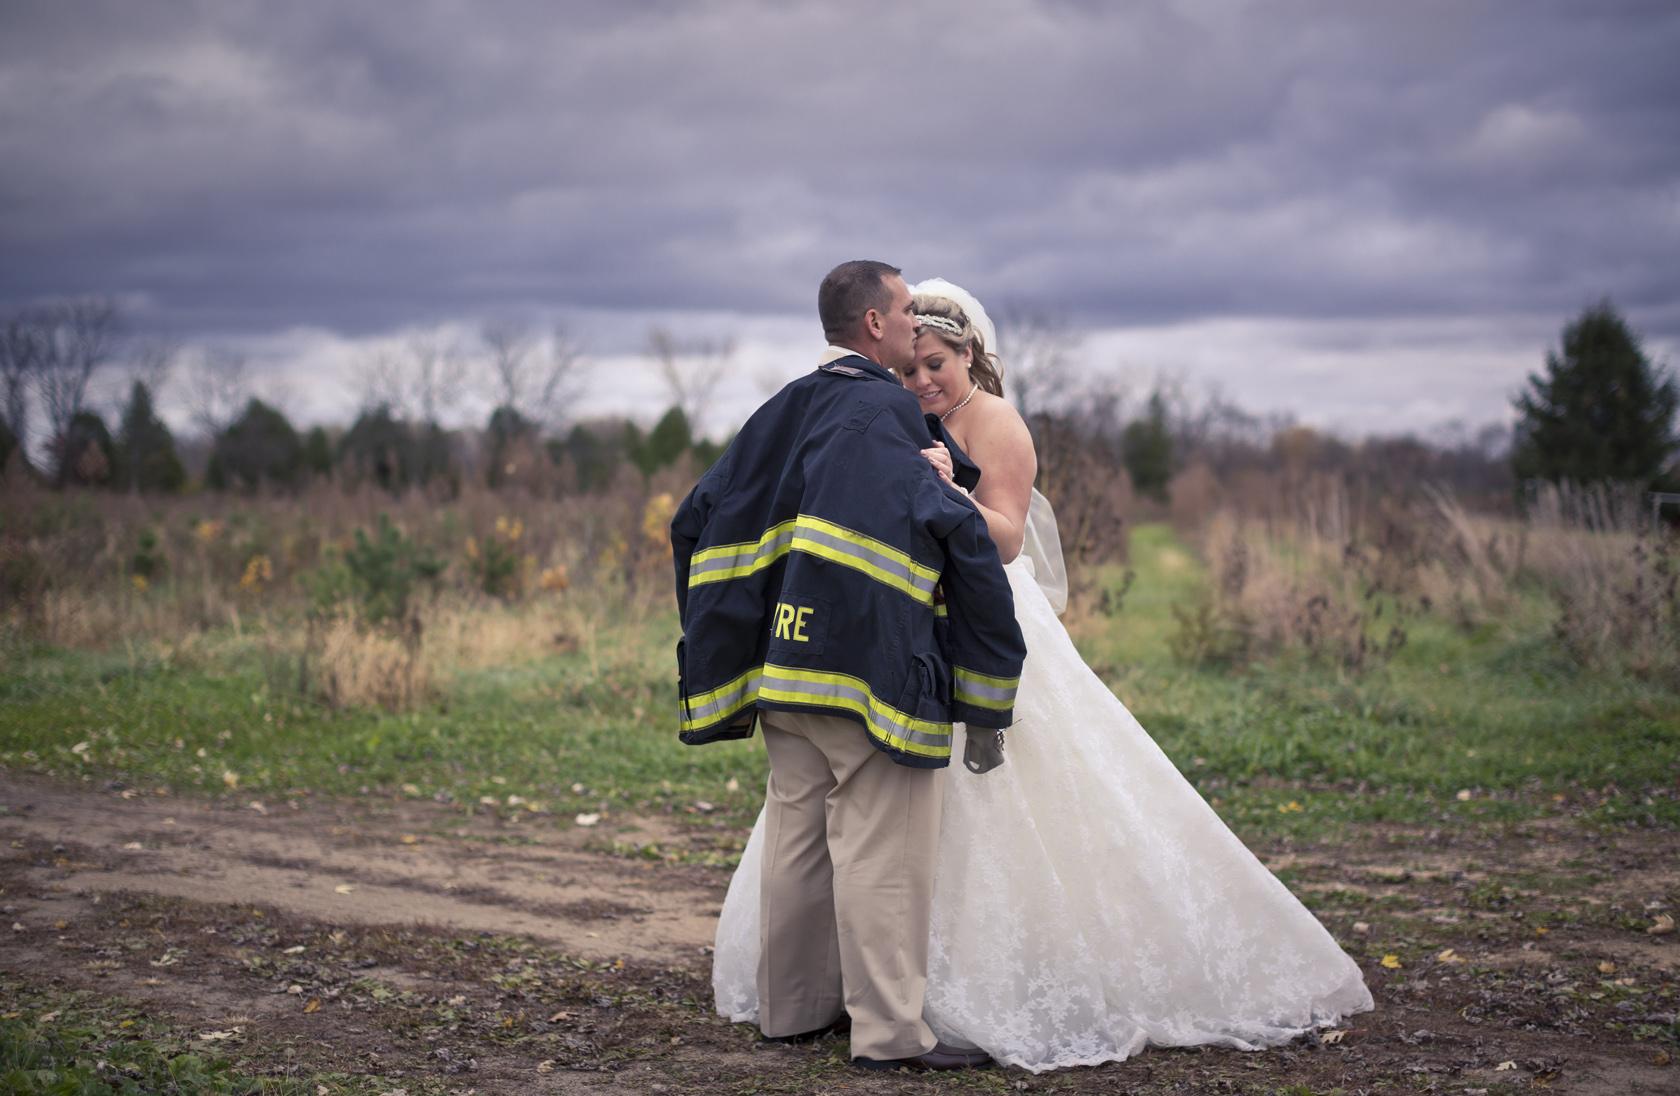 Beloit_Wedding_Photographer_Williams Tree Farm_Bride_Groom.jpg